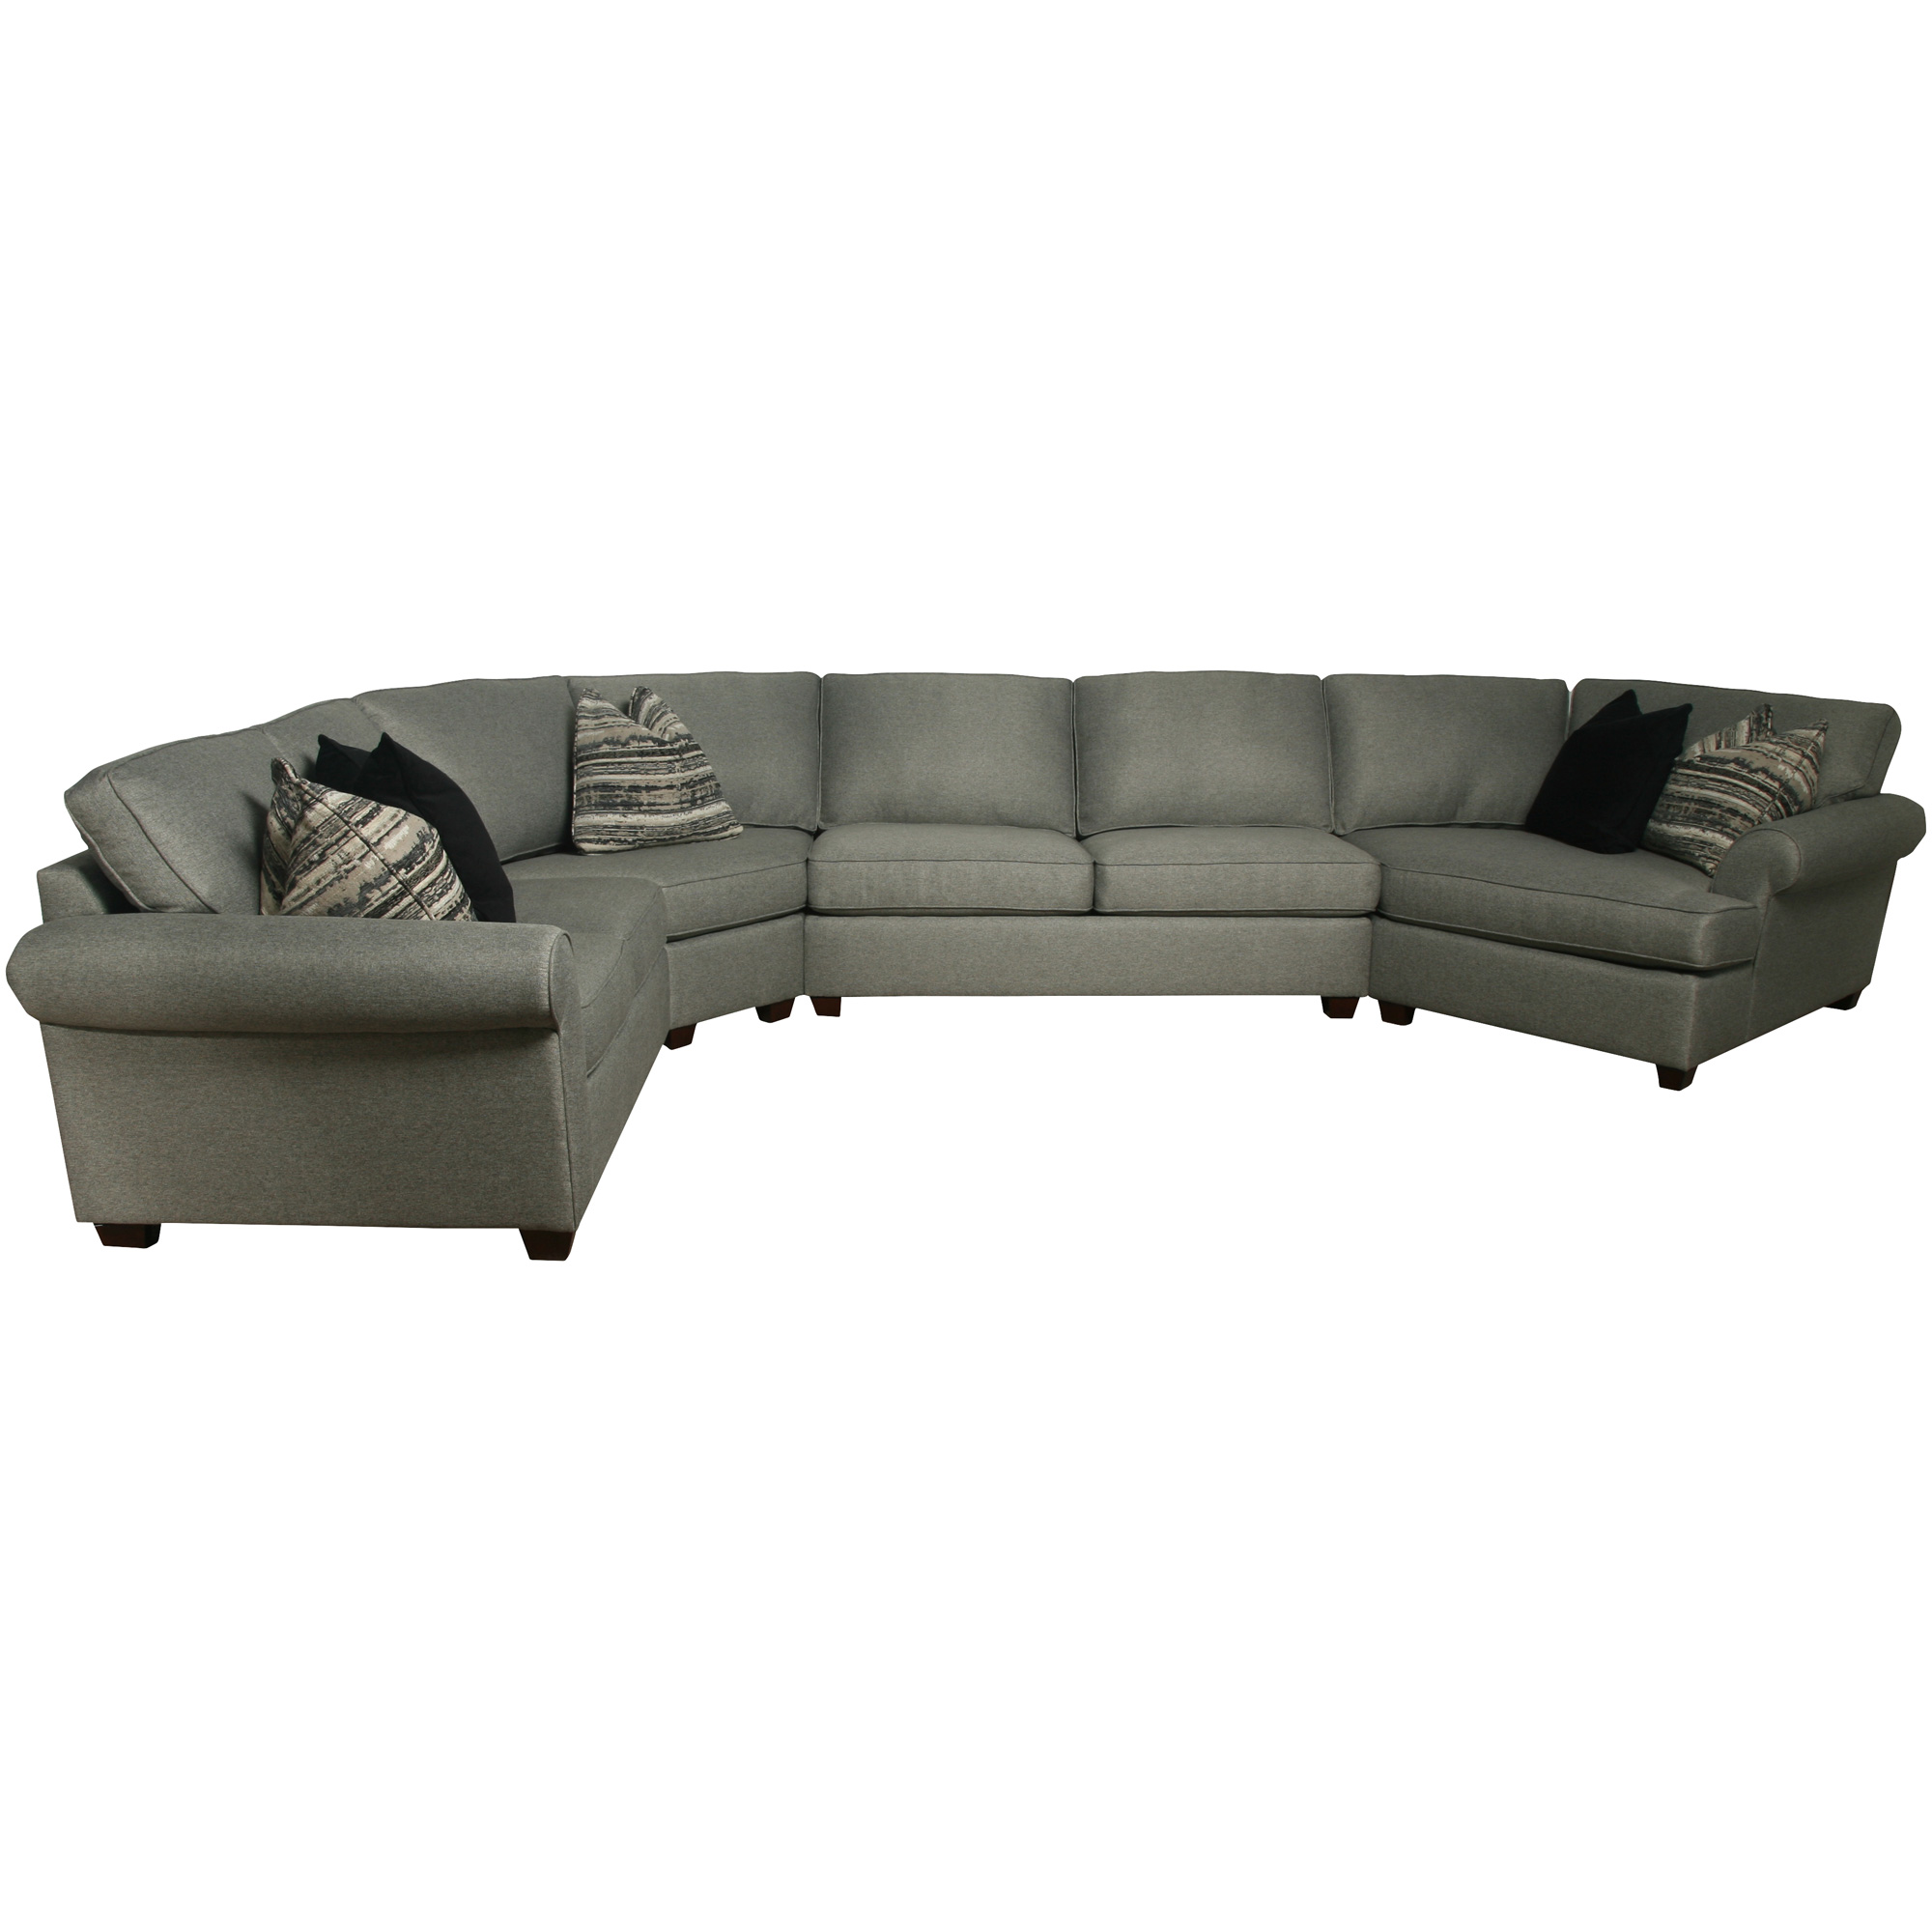 Bauhaus Furniture   Pathway Charcoal 4 Piece Right Cuddler Sectional Sofa